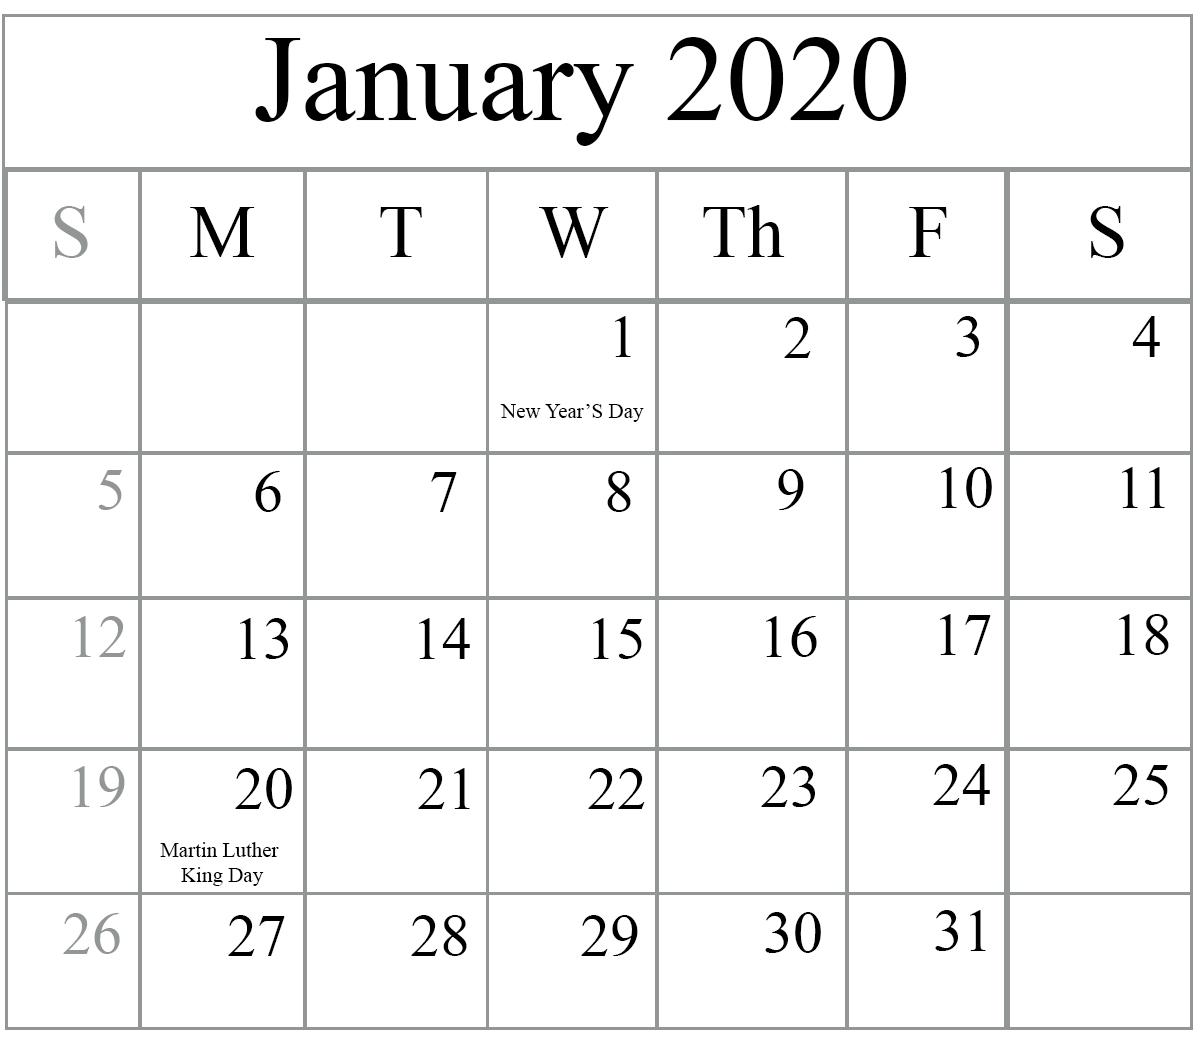 Free January 2020 Printable Calendar In Pdf, Excel & Word-January 2020 Printable Calendar With Holidays